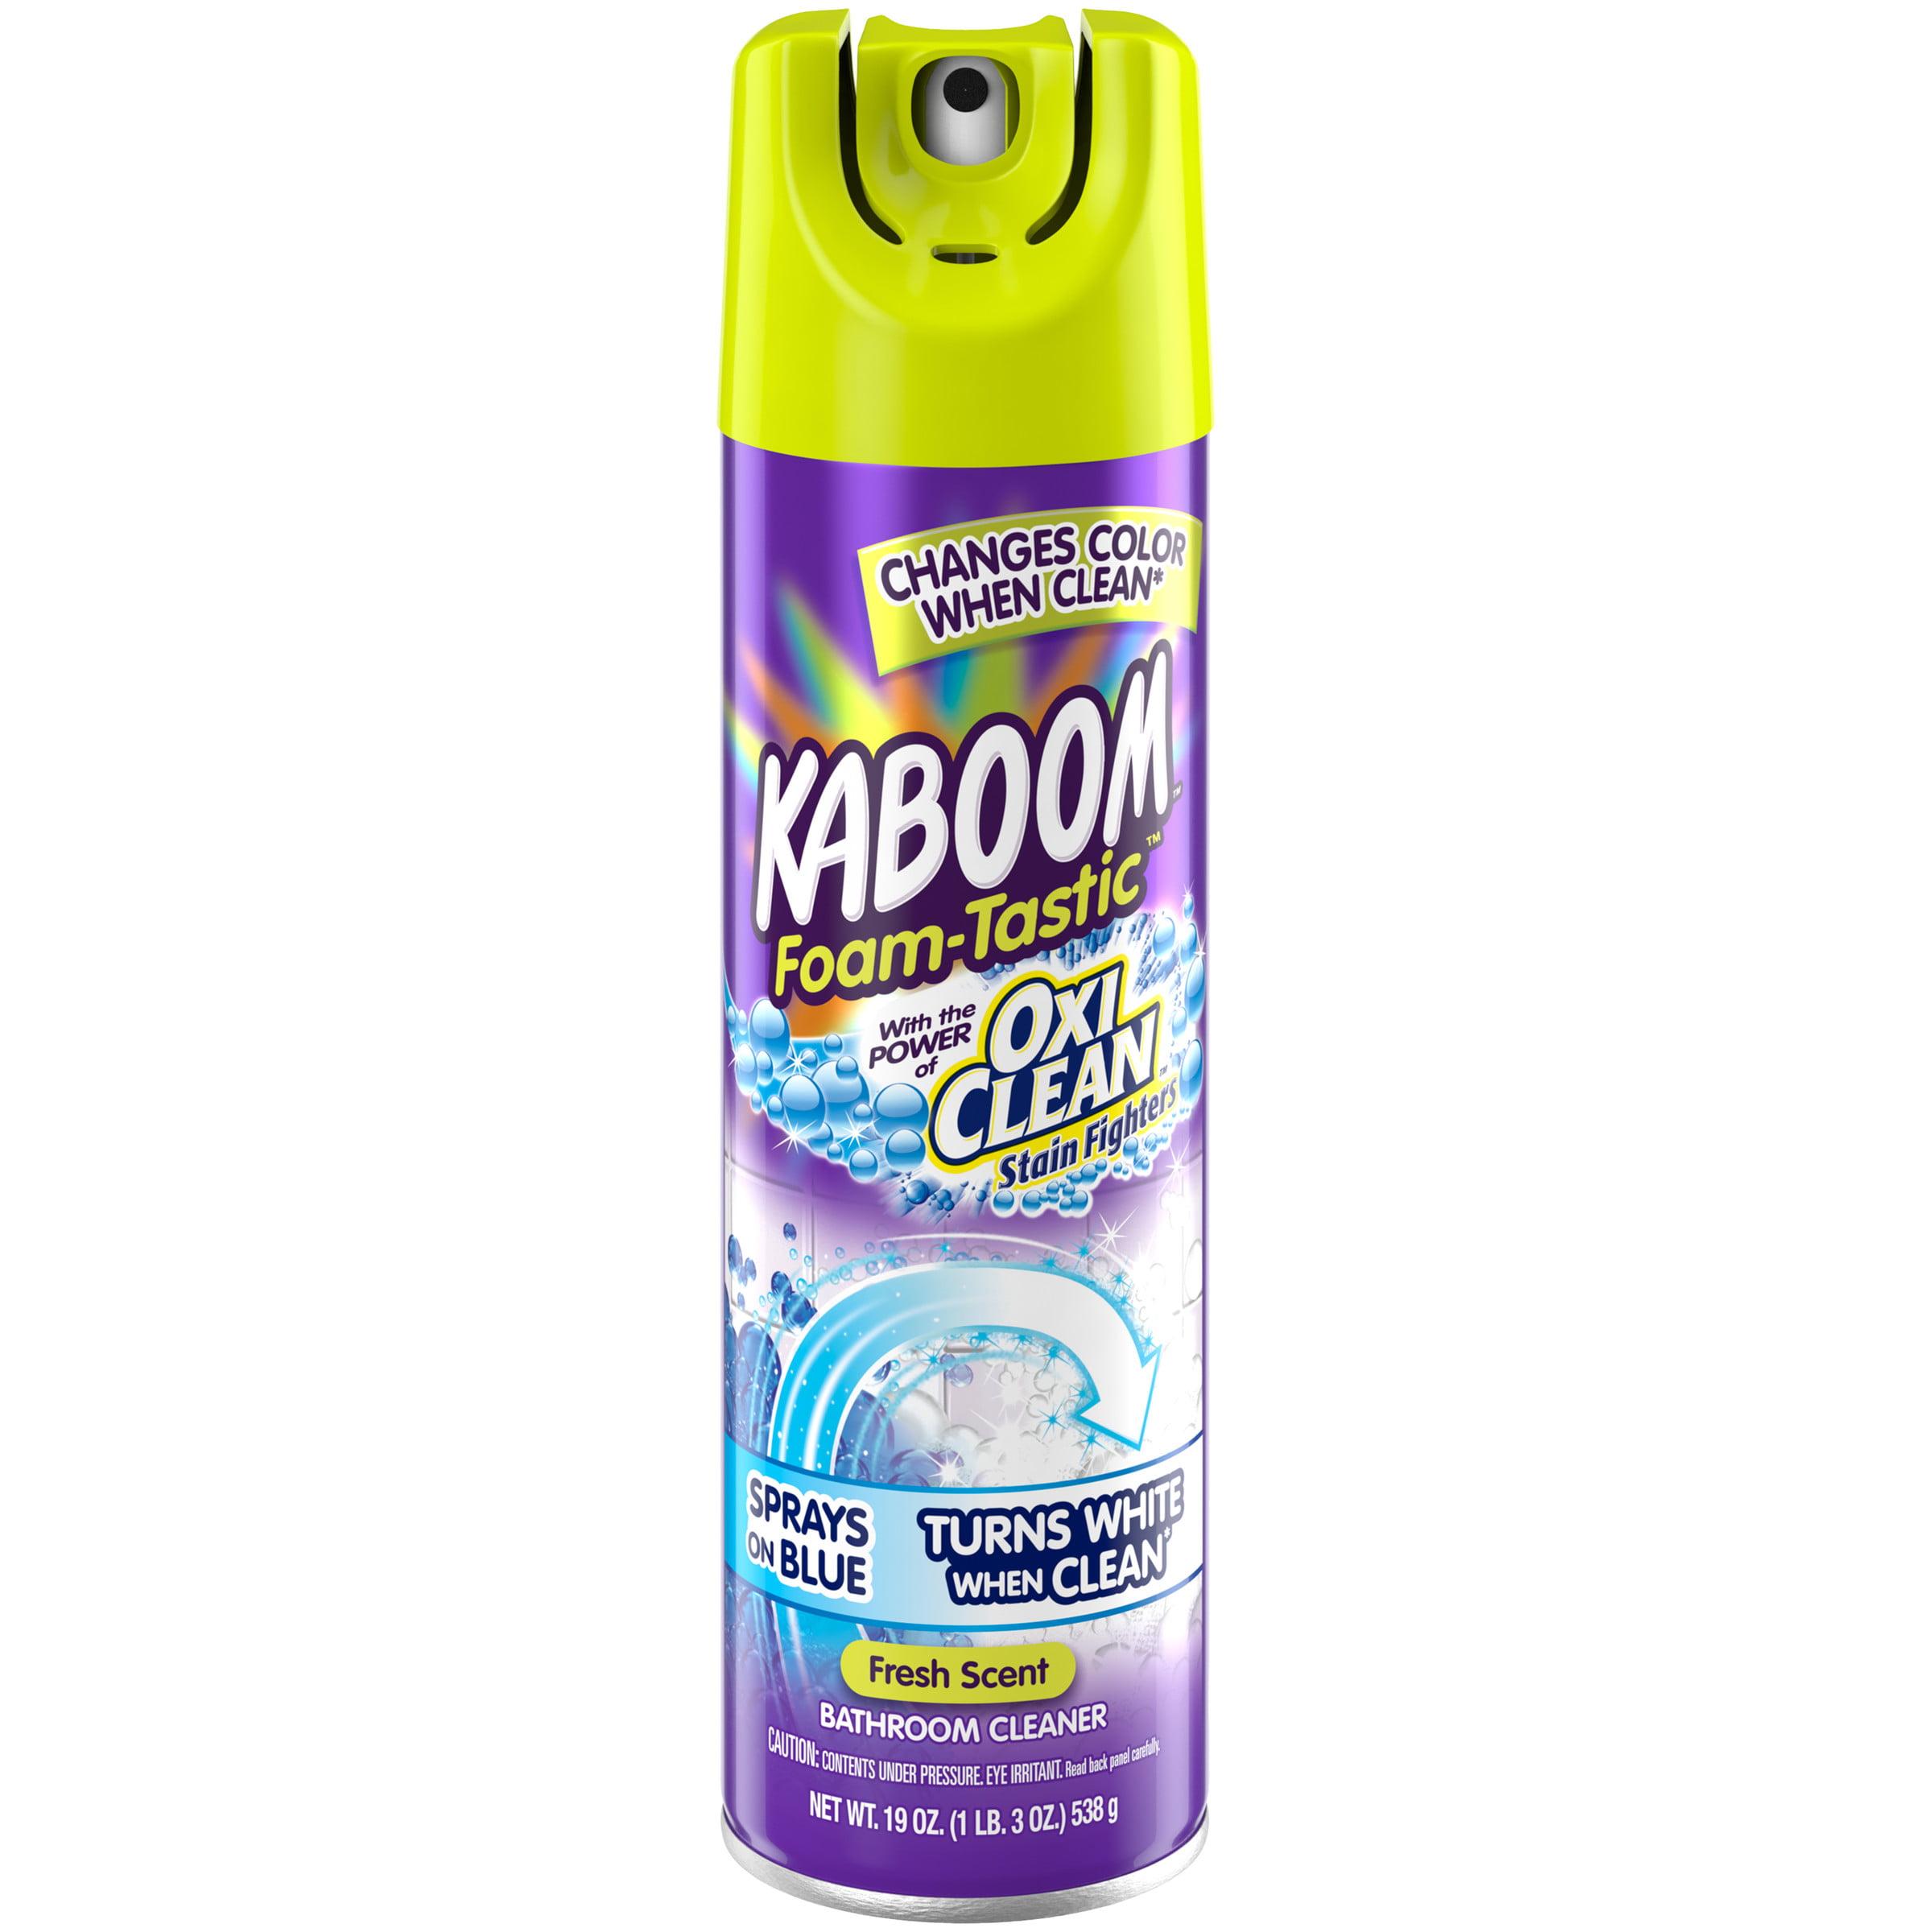 Kaboom Foam Tastic With Oxiclean Fresh Scent Bathroom Cleaner 19 Oz Walmart Com Walmart Com